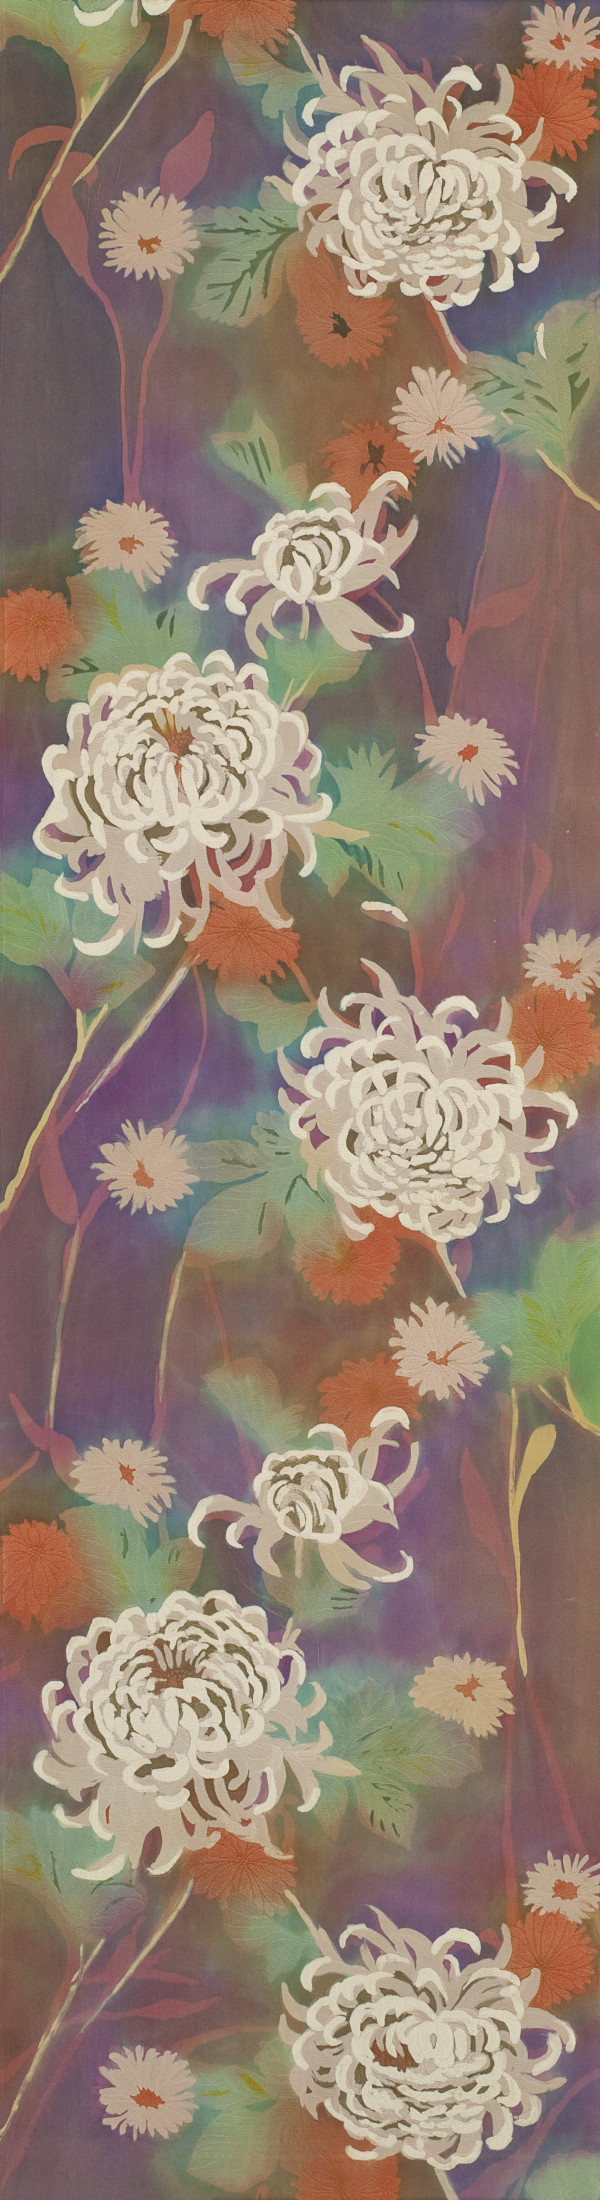 Homage to William Morris I by Mary Edna Fraser